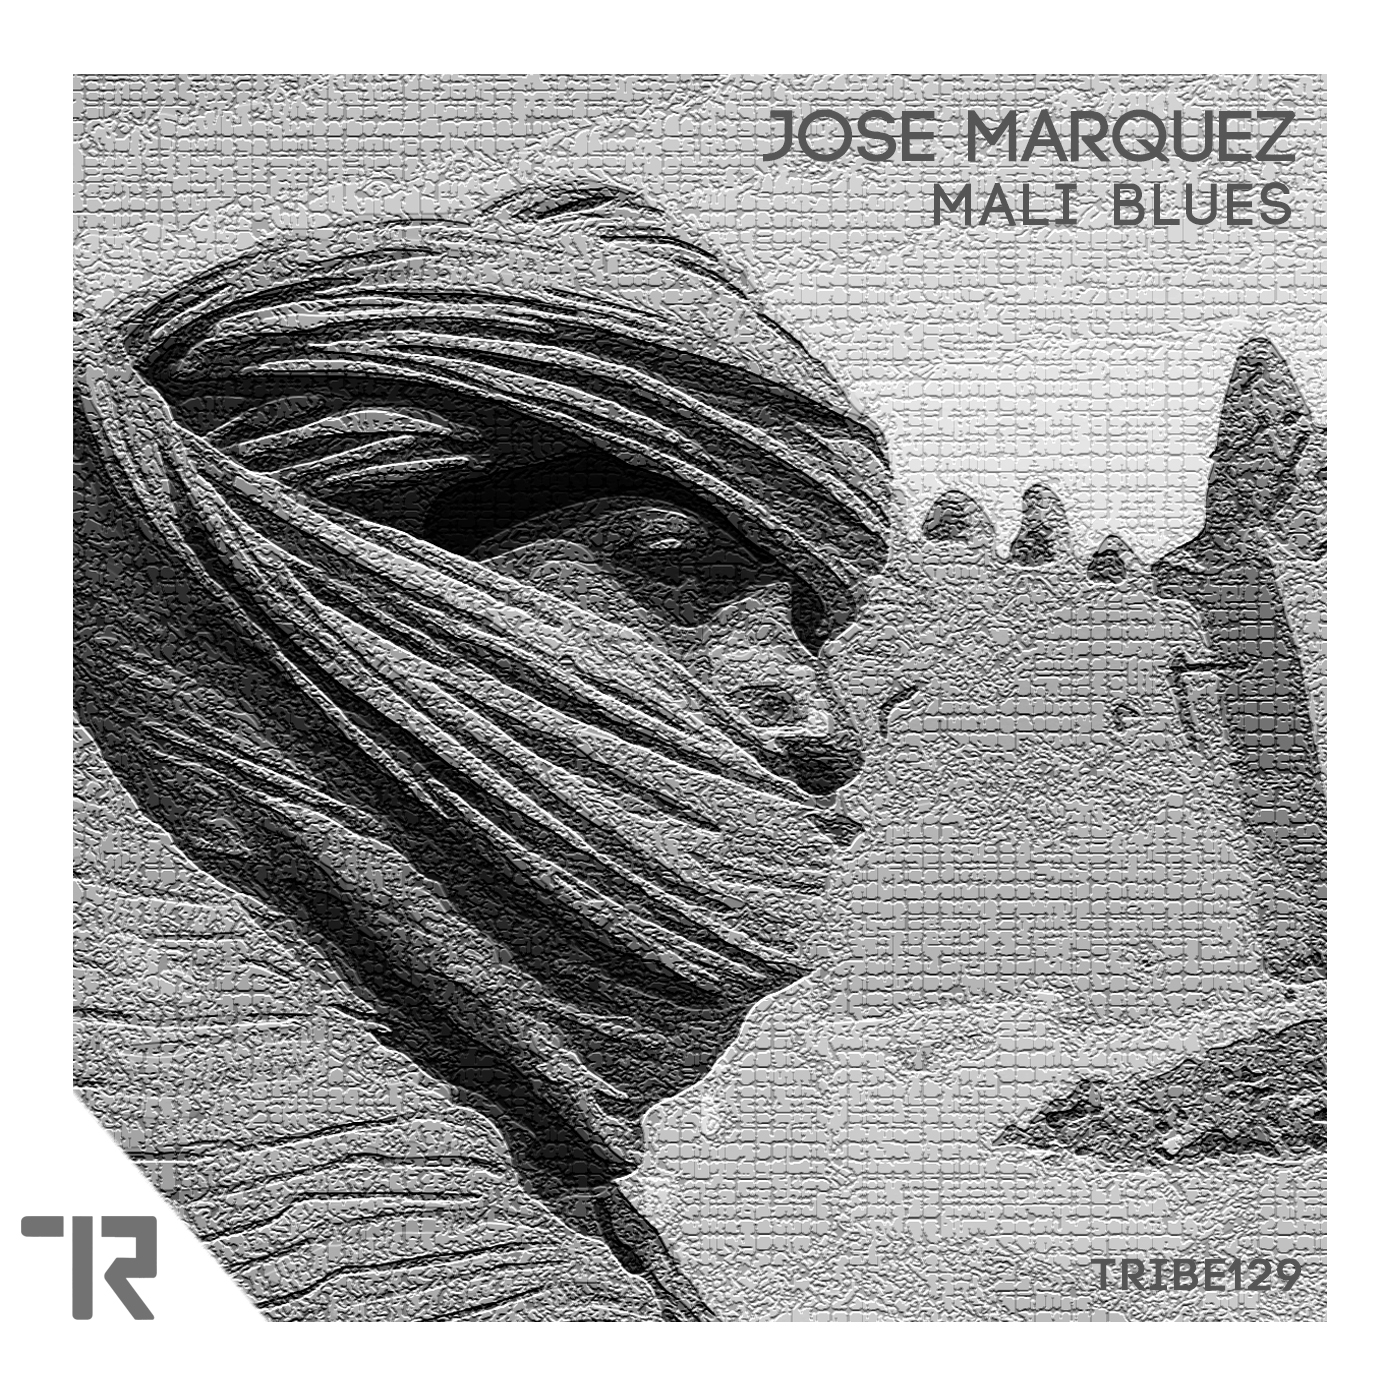 JOSE MARQUEZ               MALI BLUES